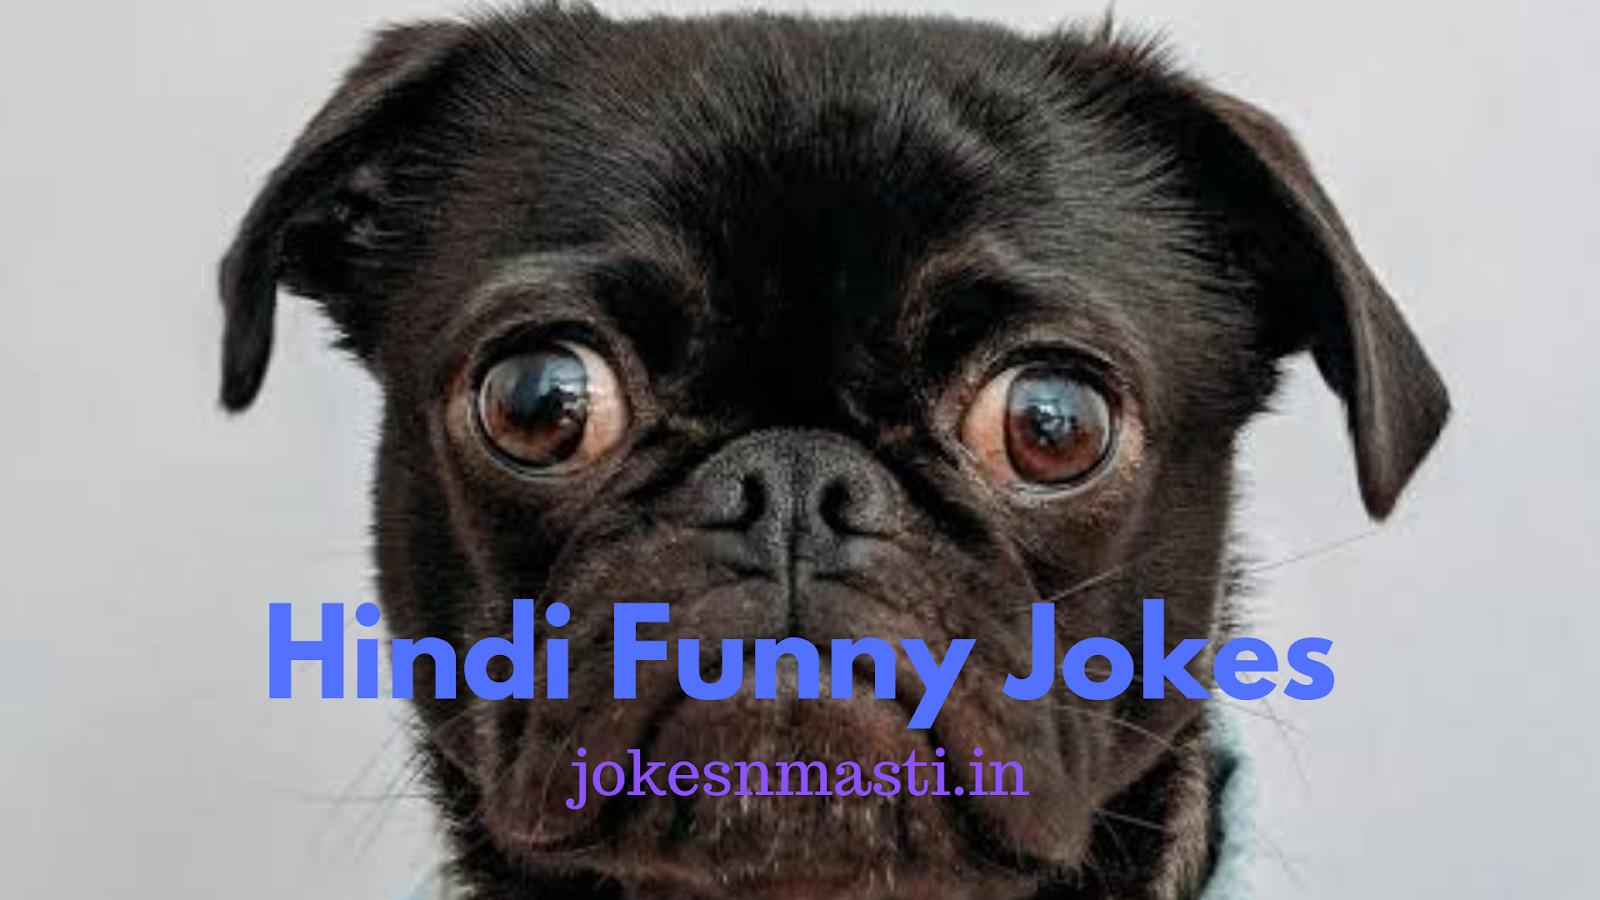 Pati Patni Hindi Funny Jokes, Boys and Girls Funny Jokes Download